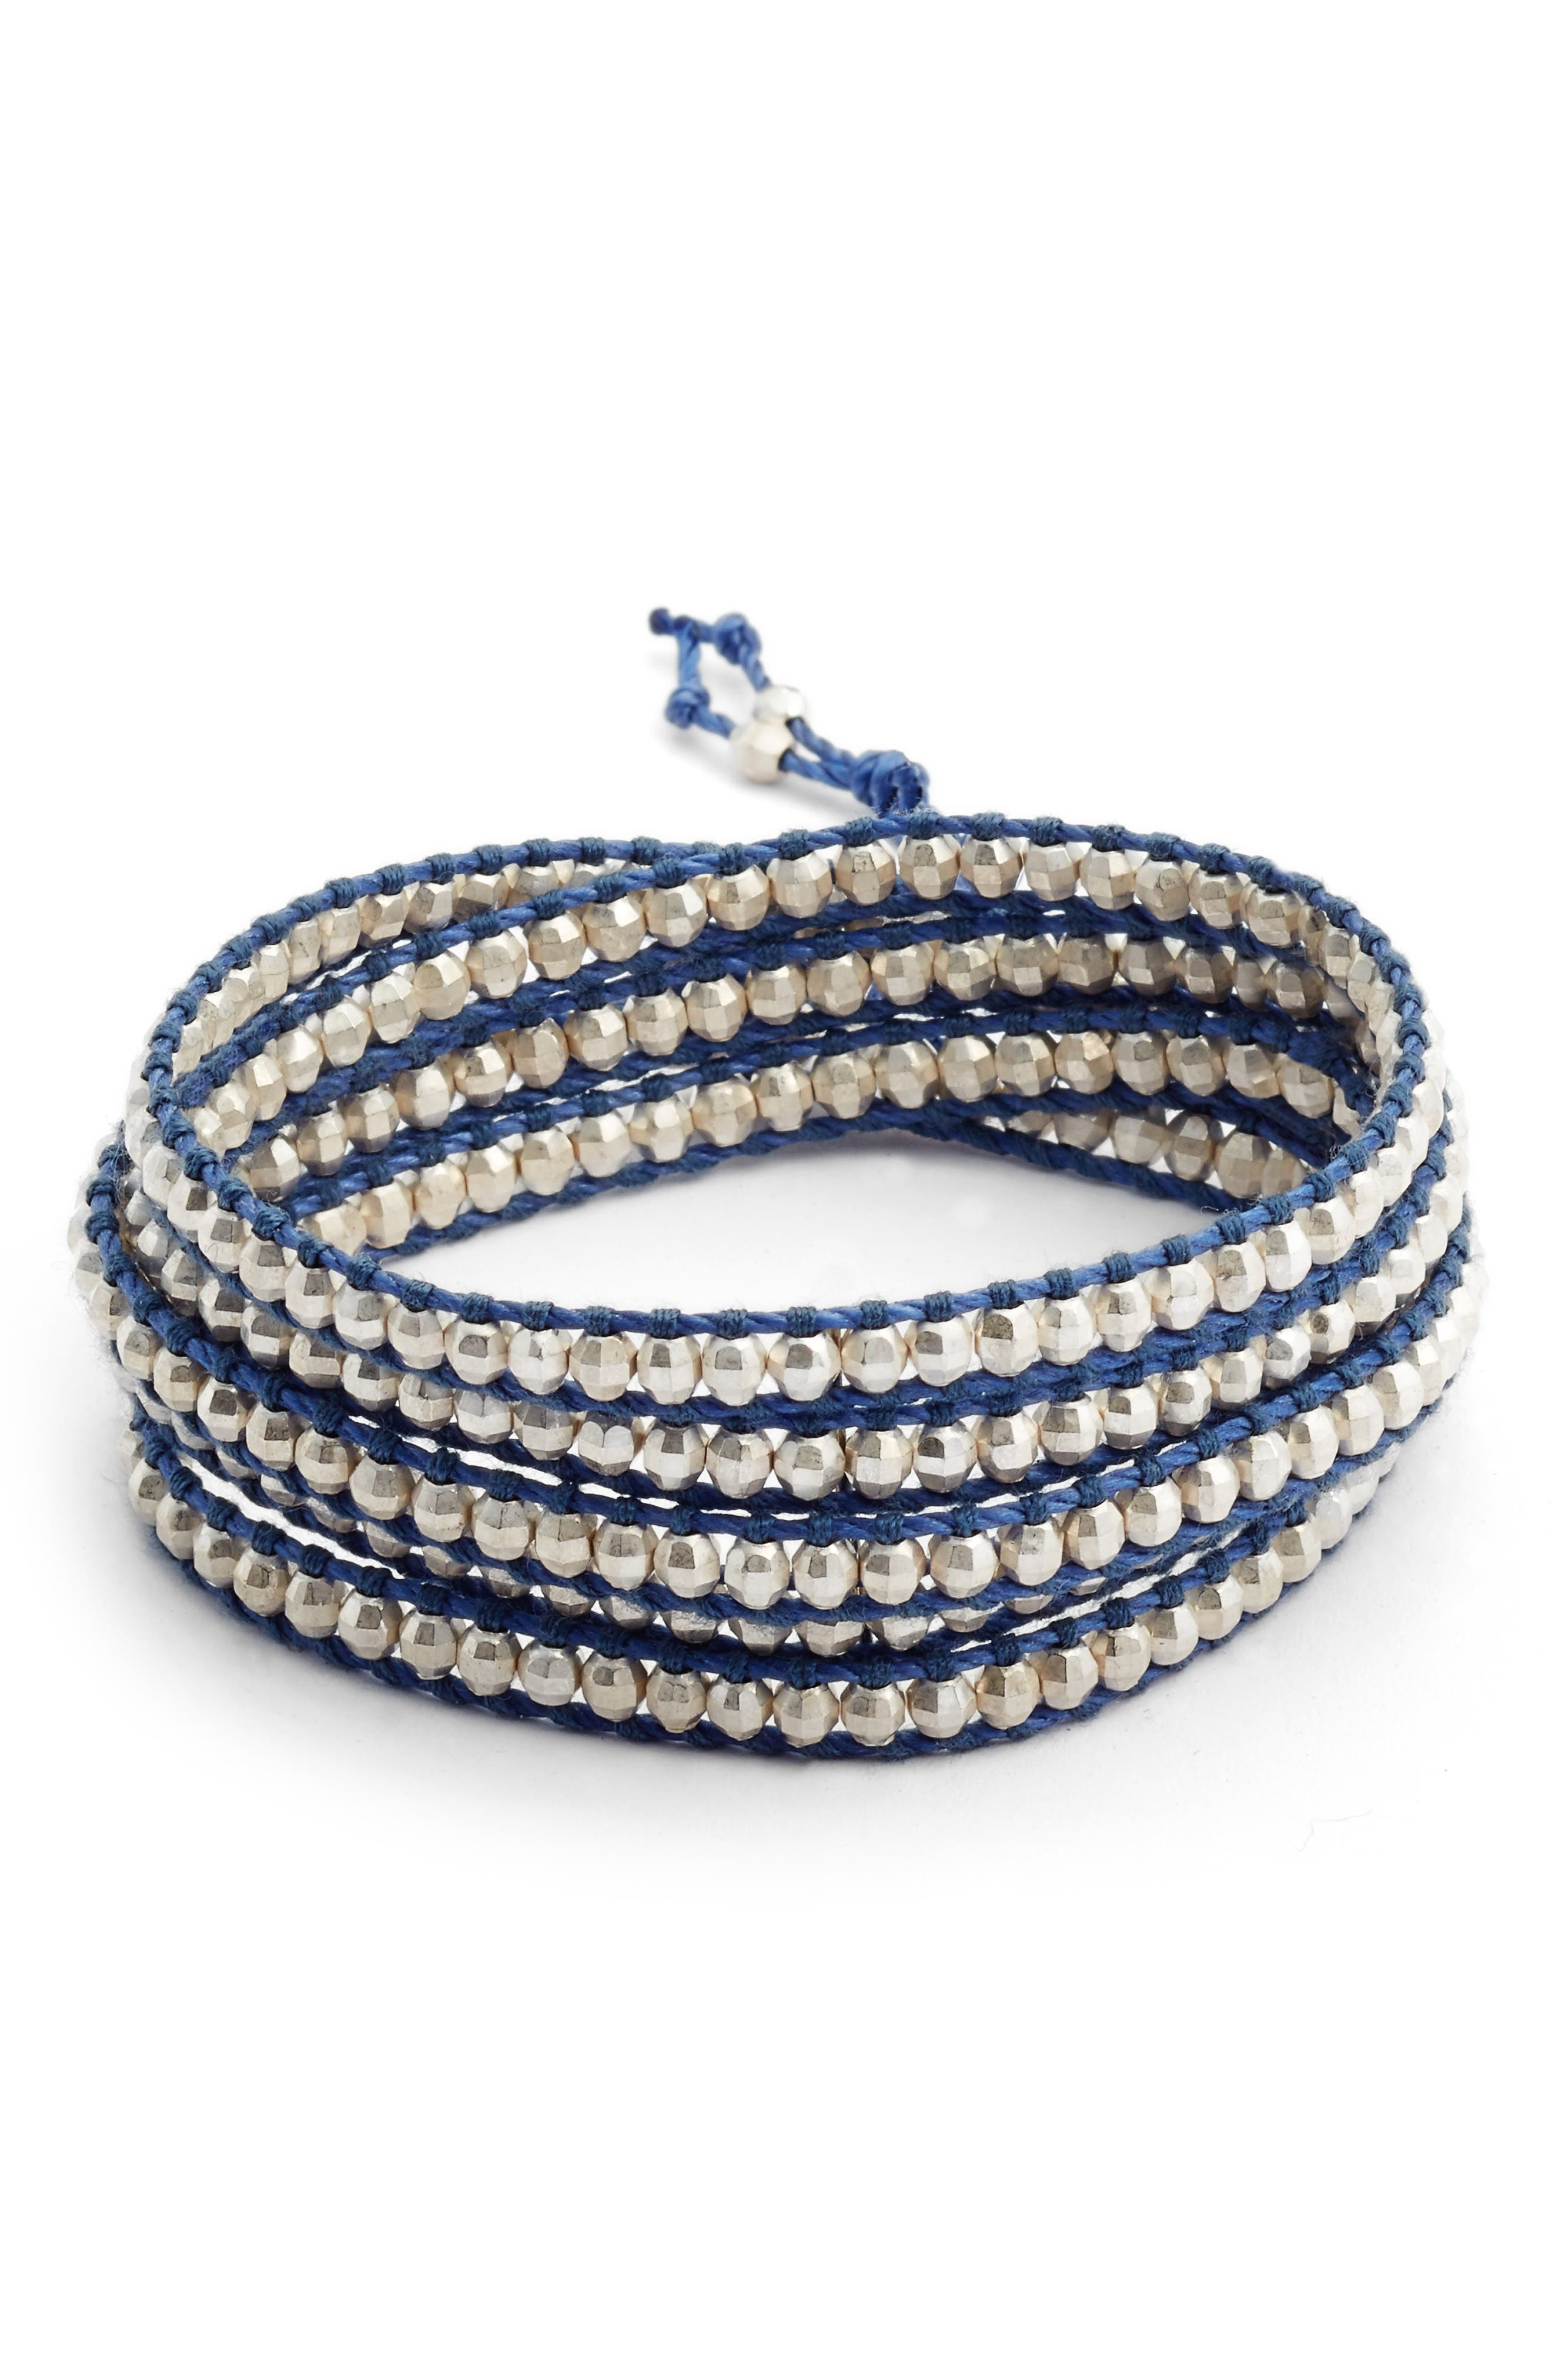 Beaded Multistrand Bracelet,                             Main thumbnail 1, color,                             400